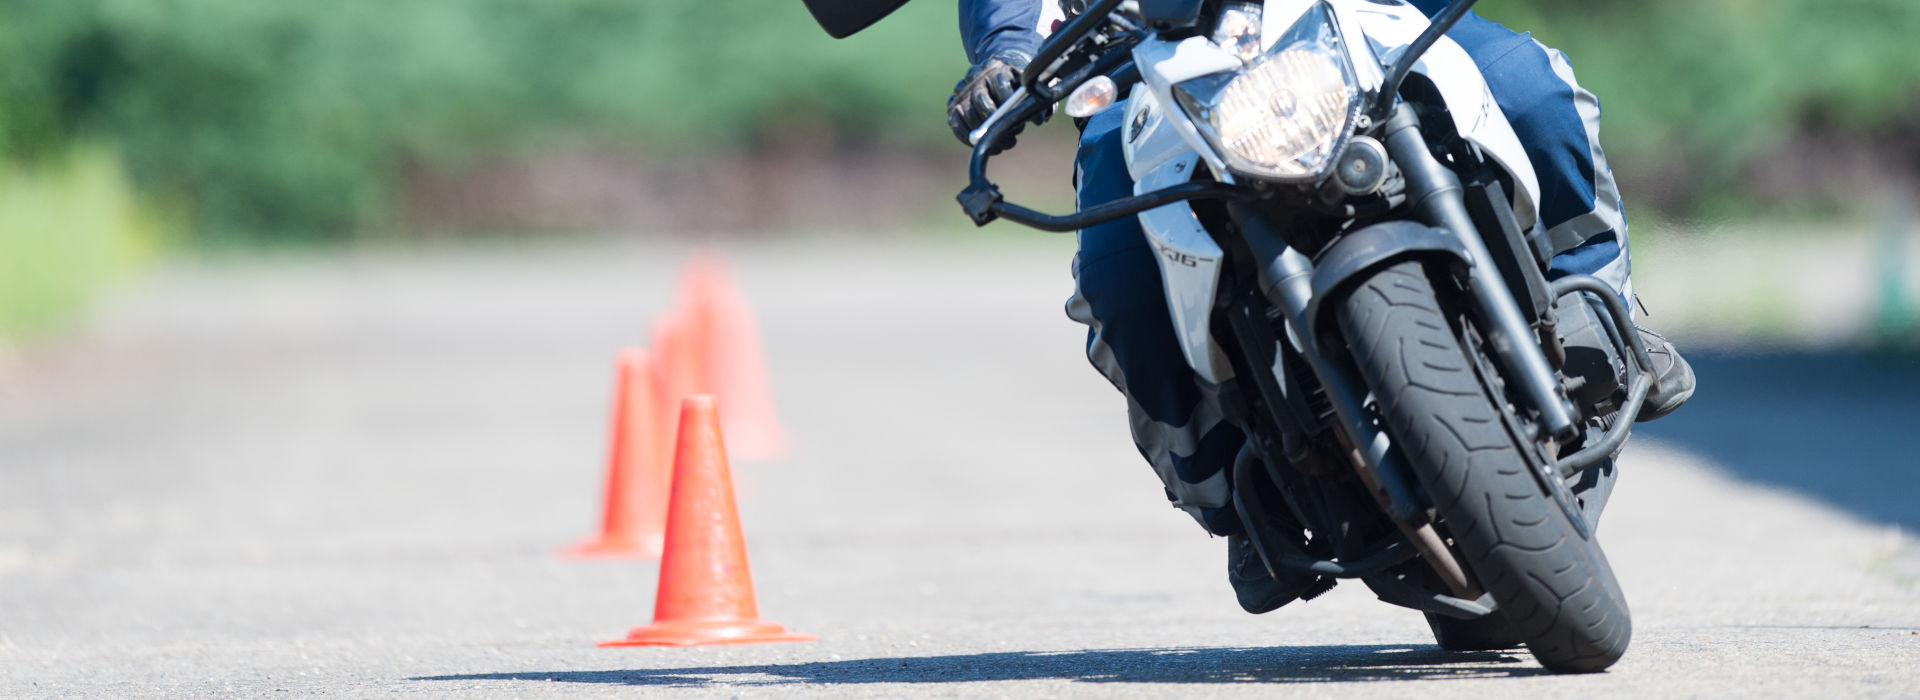 Motorrijbewijspoint Lelystad motor rijvaardigheid